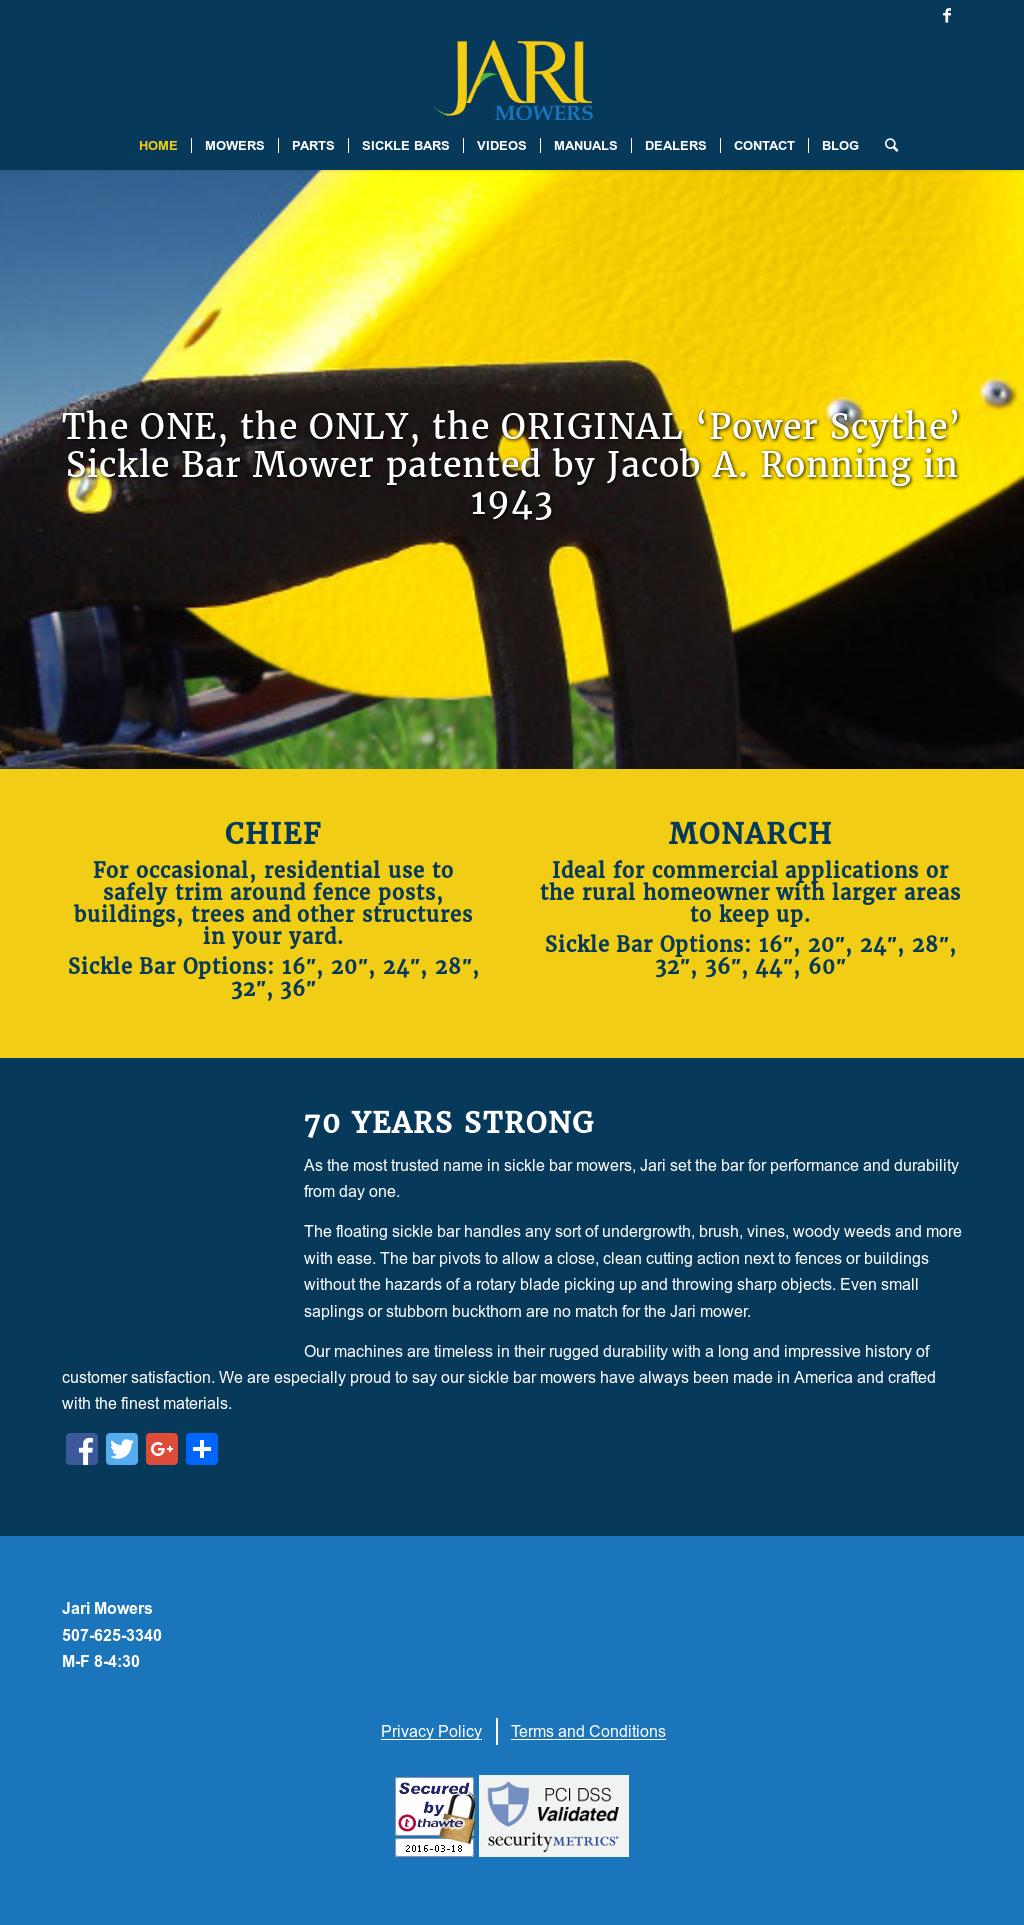 Jari Mowers Competitors, Revenue and Employees - Owler